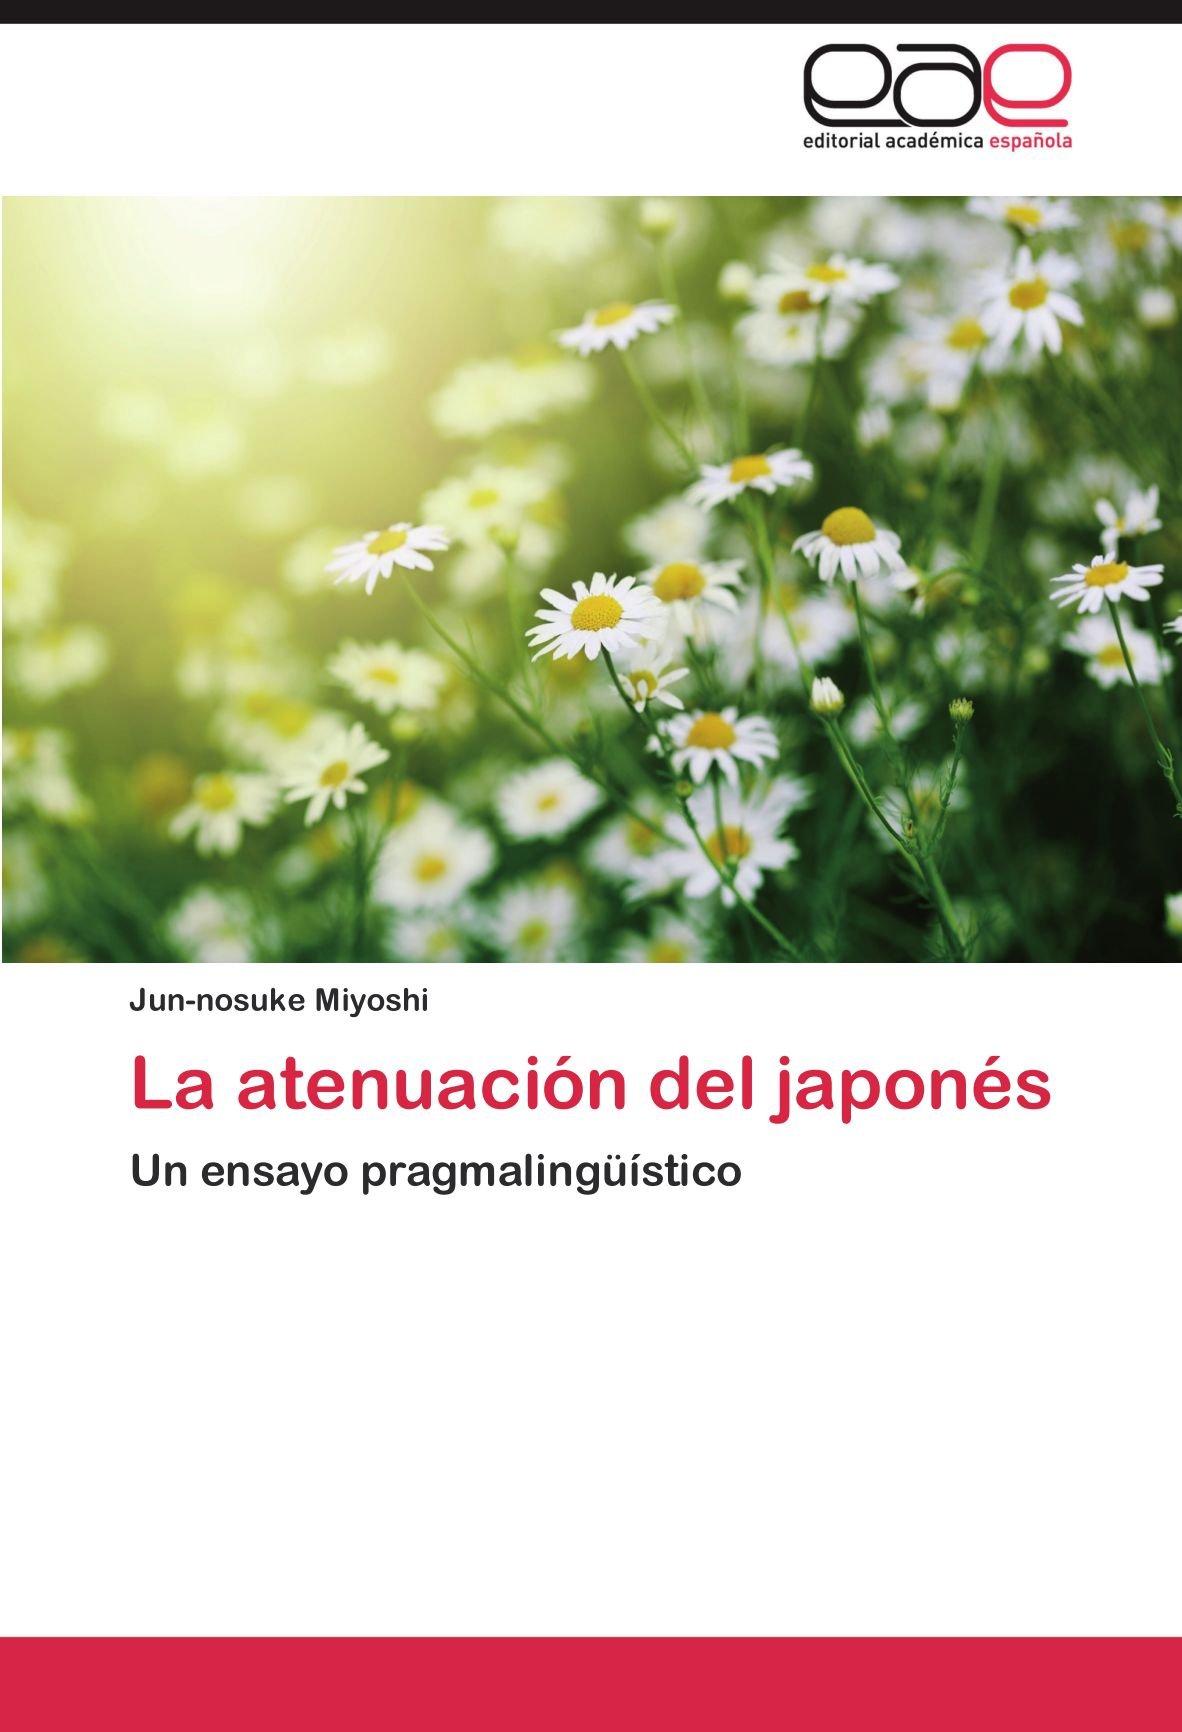 La atenuación del japonés: Un ensayo pragmalingüístico (Spanish Edition): Jun-nosuke Miyoshi: 9783659002618: Amazon.com: Books